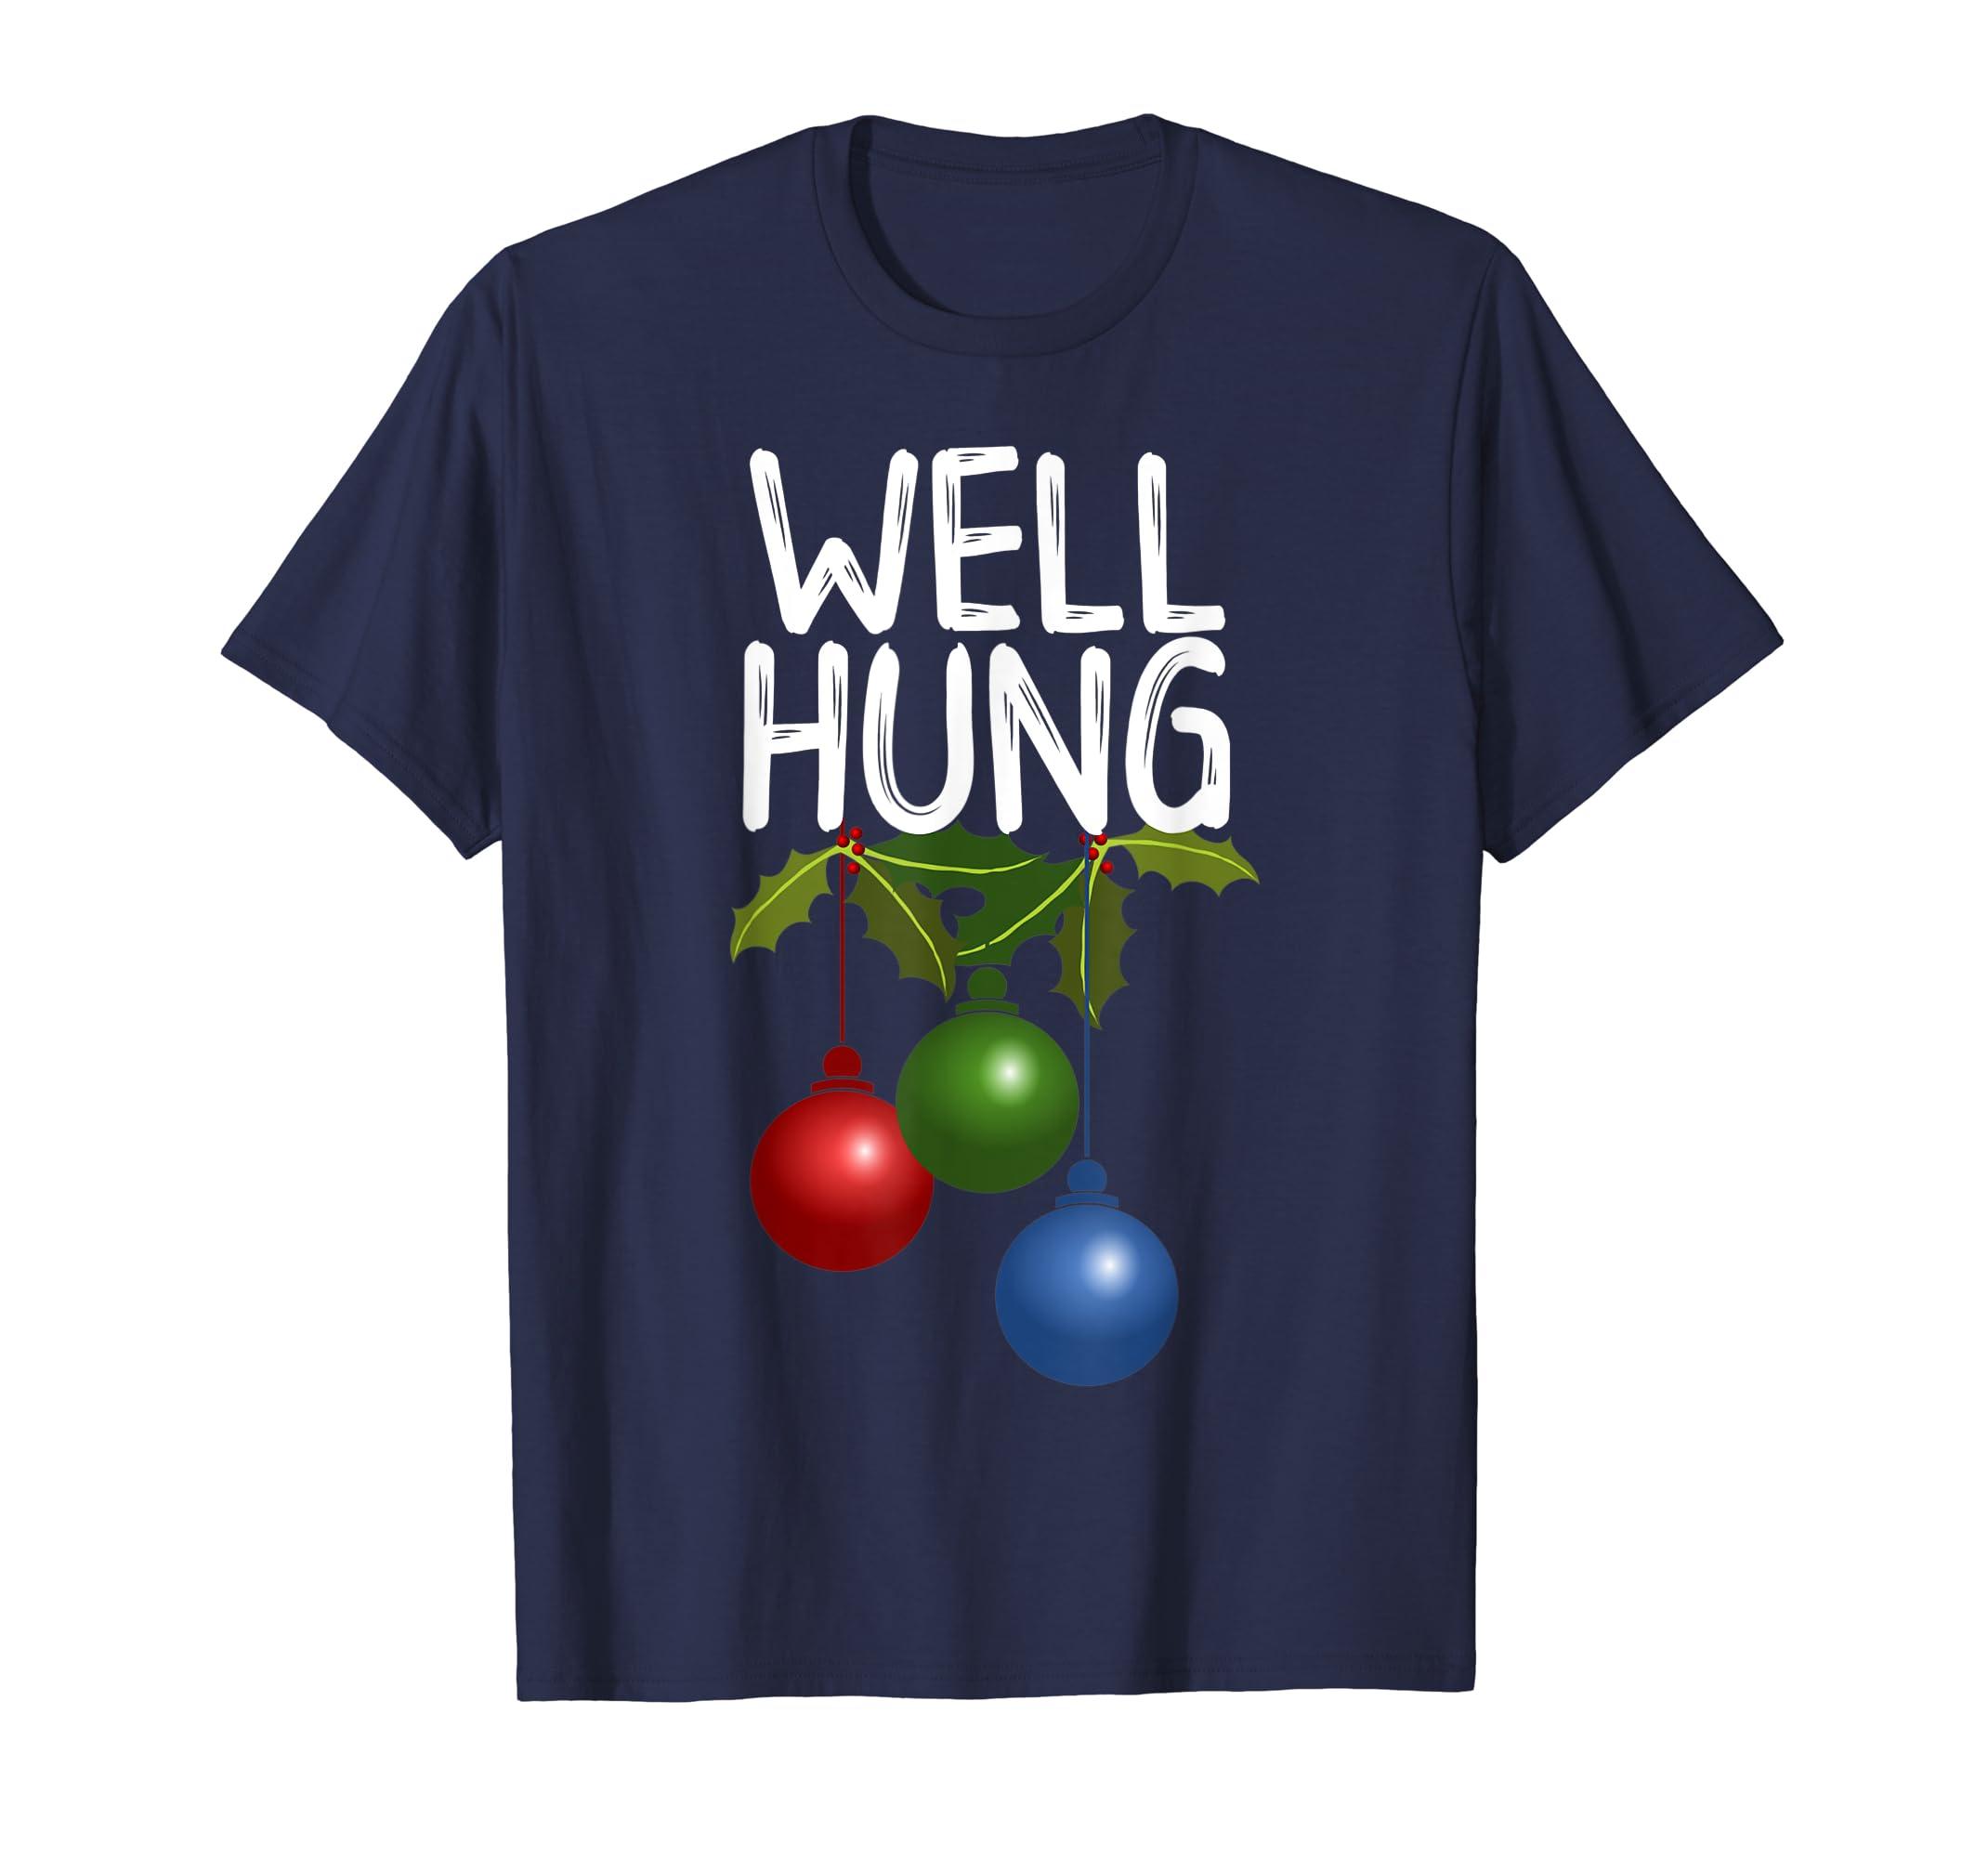 39daa246780 Amazon.com  Mens Well Hung Funny Christmas T- Shirt For Men  Clothing